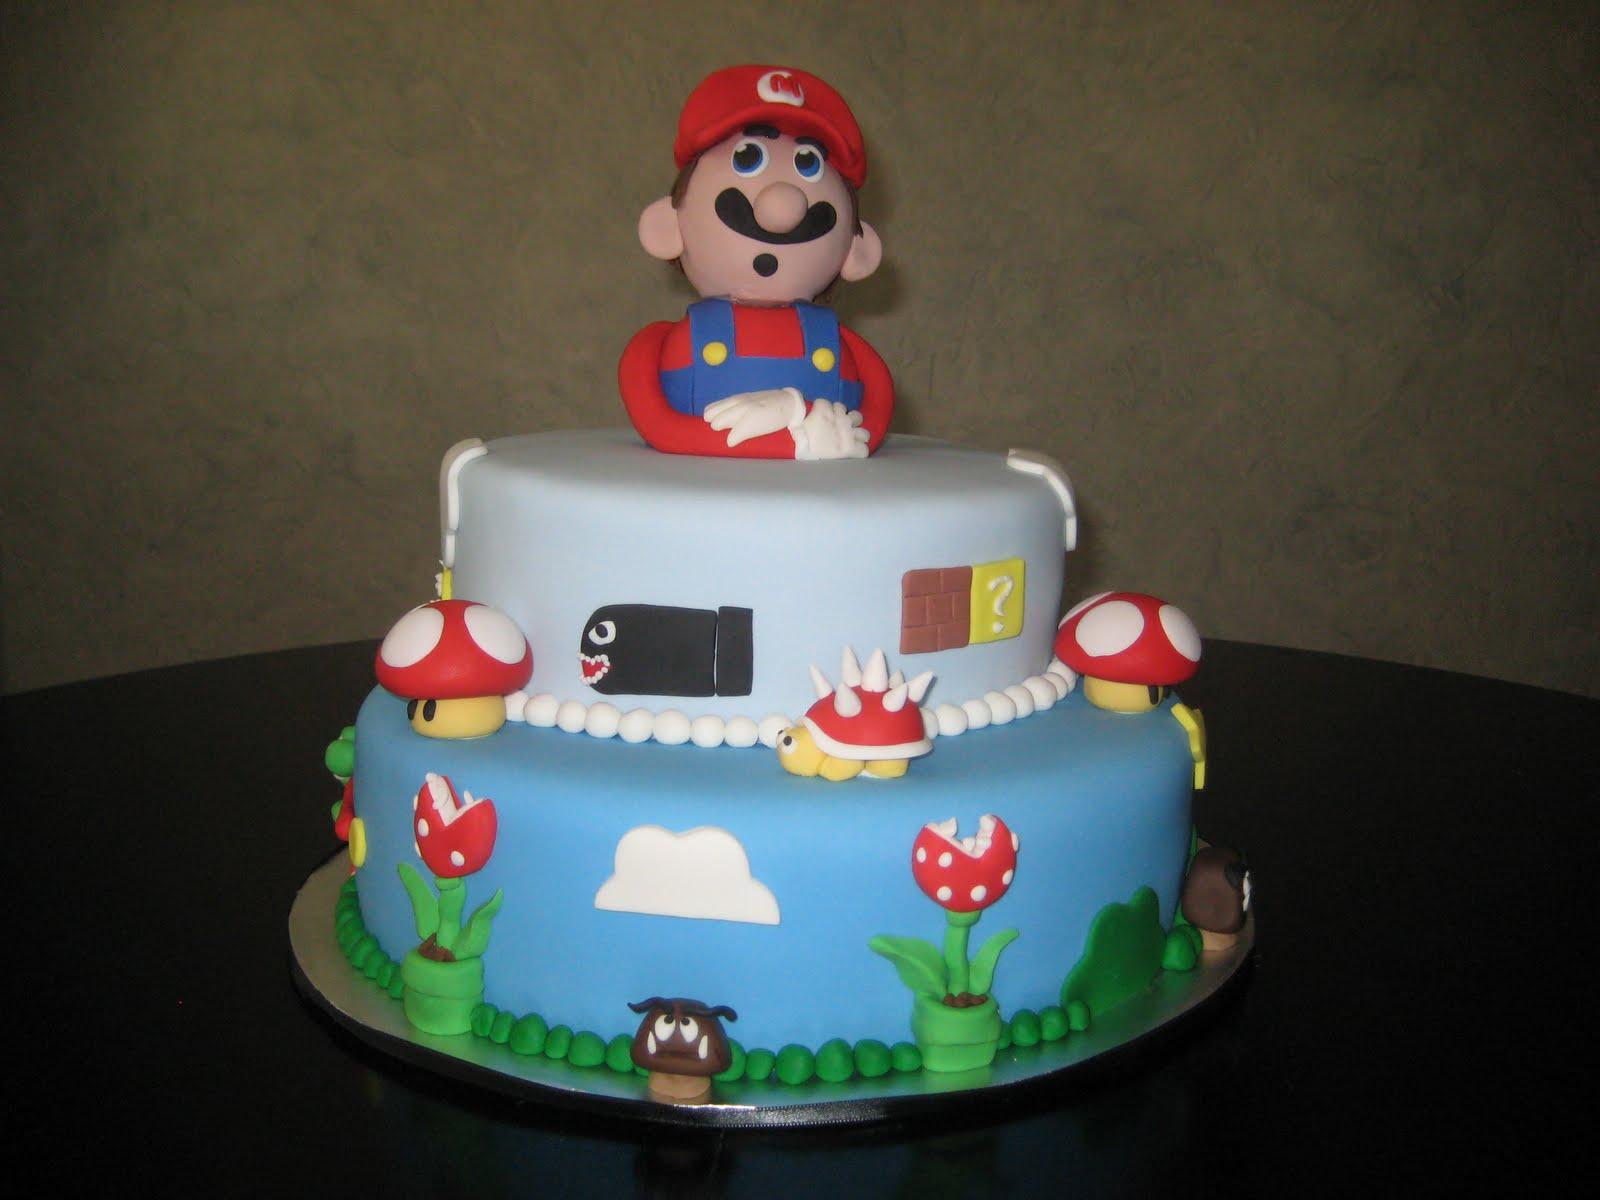 Mario Brother Cake Images : Taryne s Tasty Treats: Super Mario Bros. Cake